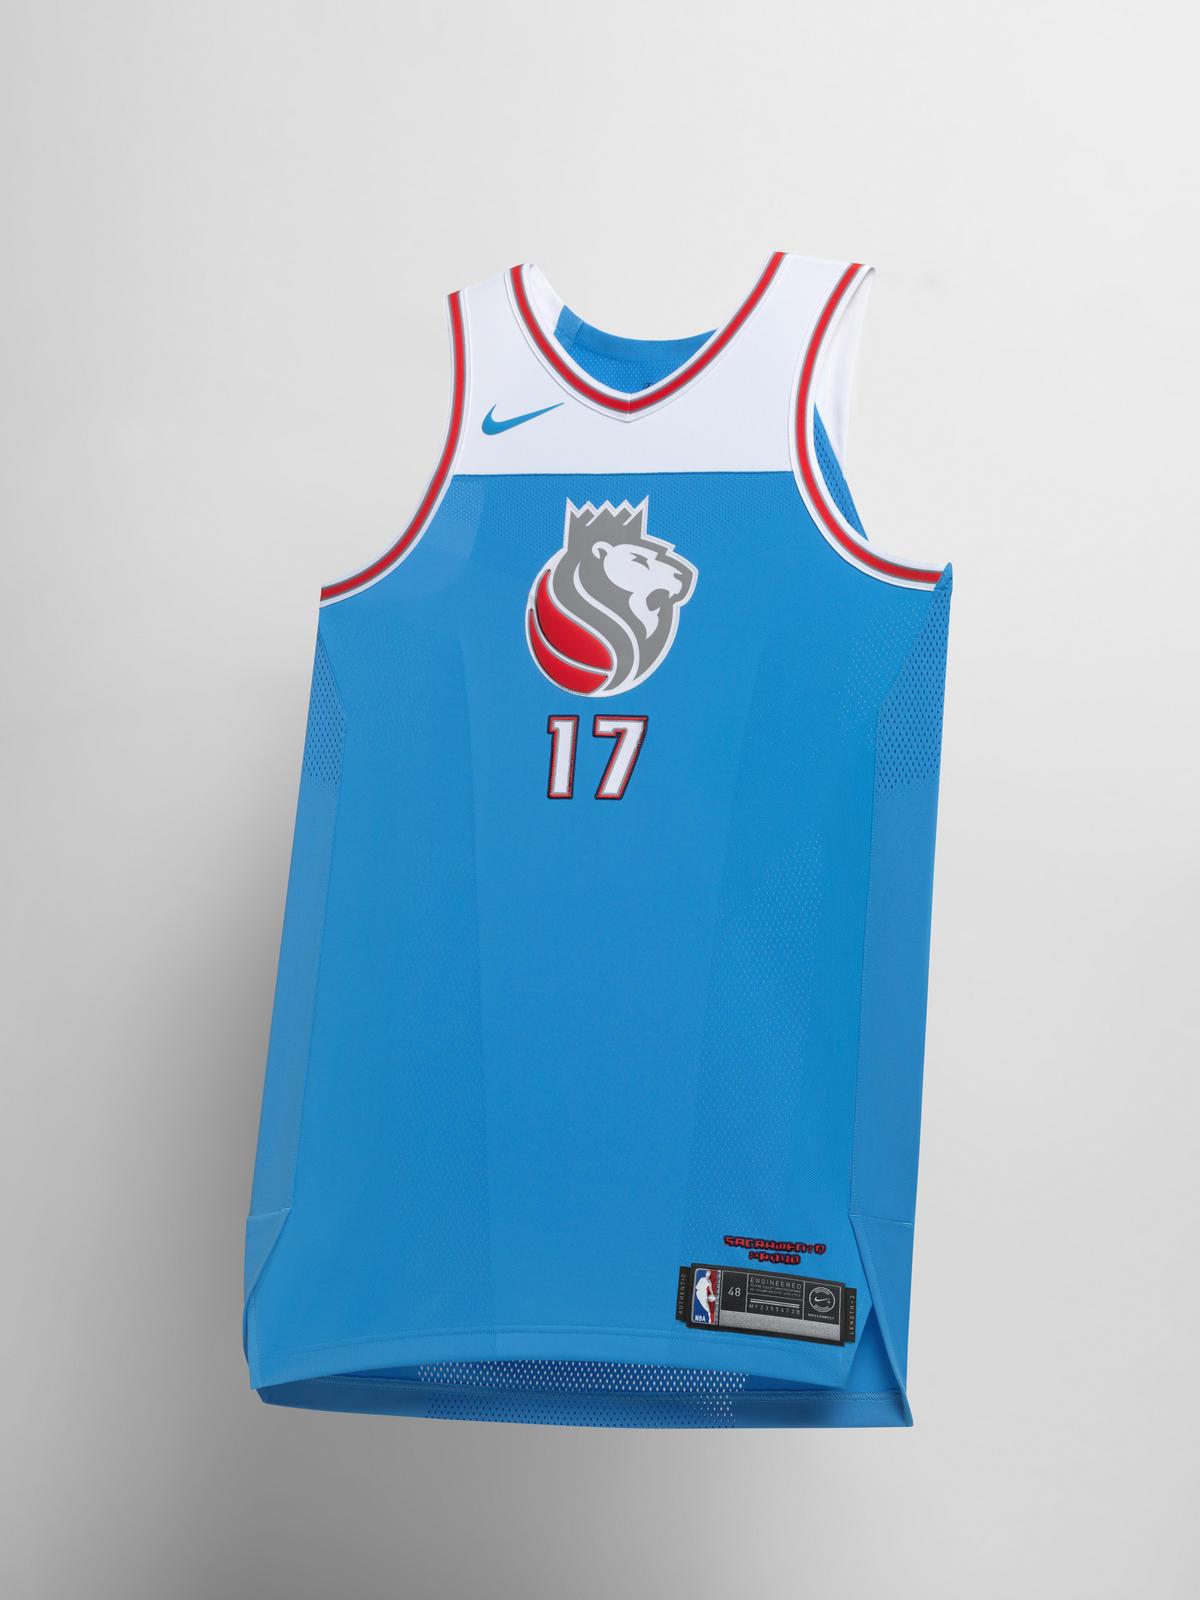 Nike_NBA_City_Edition_Uniform_Sacramento_Kings_0126.jpg_native_1600